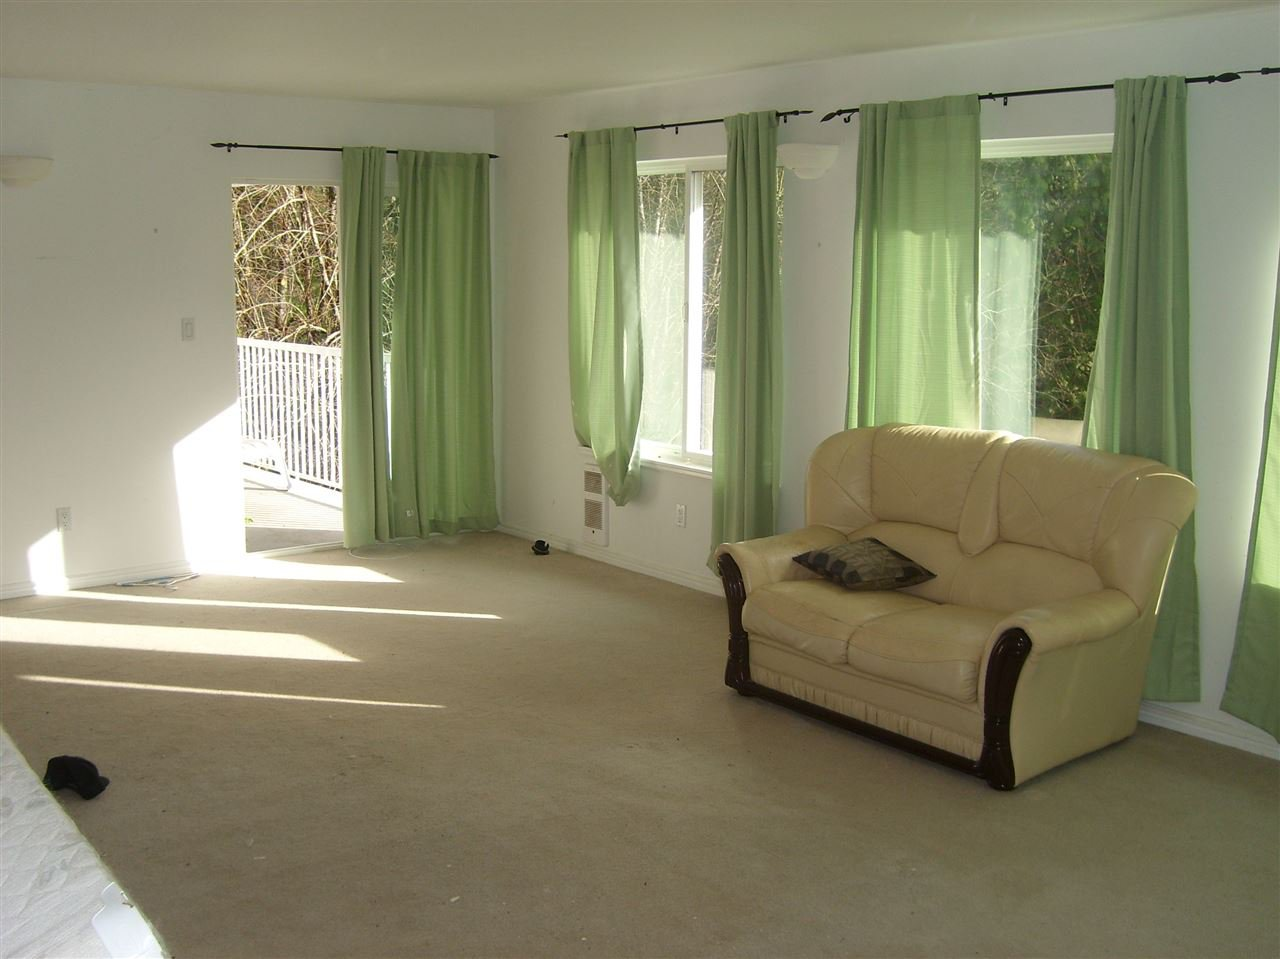 Photo 8: Photos: 28640 123 Avenue in Maple Ridge: Northeast House for sale : MLS®# R2419989